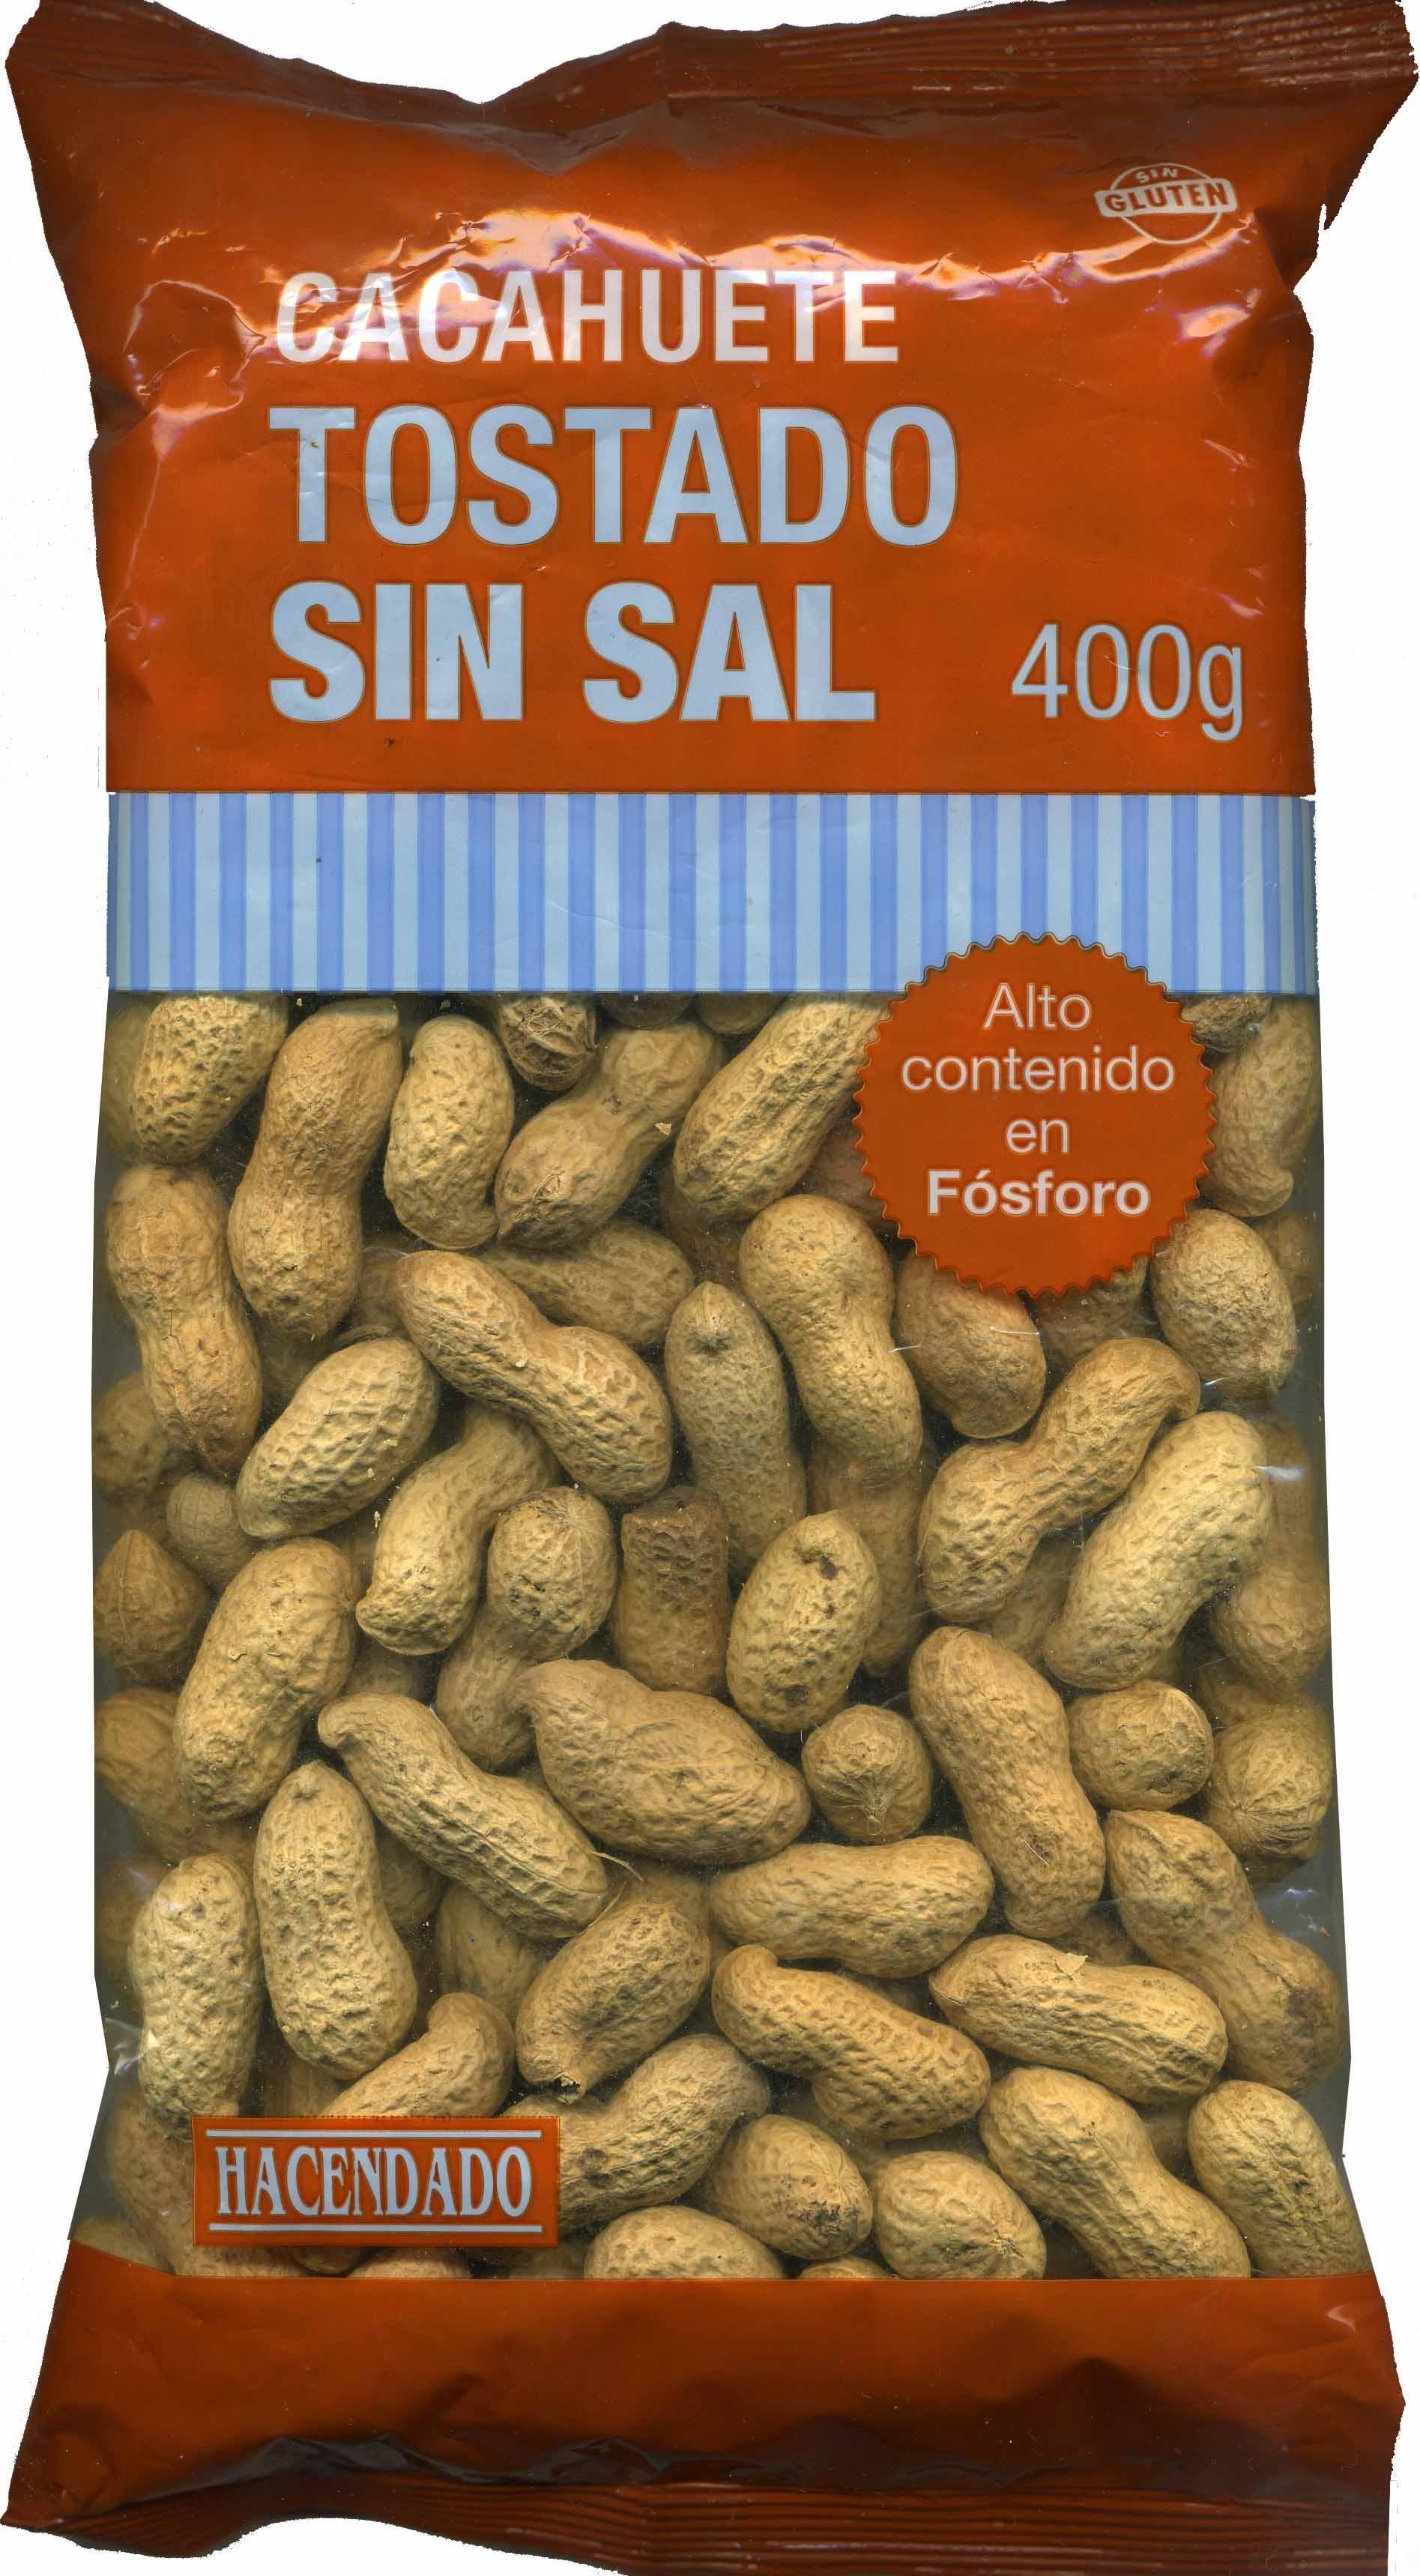 Cacahuete tostado 0% sal añadida - Product